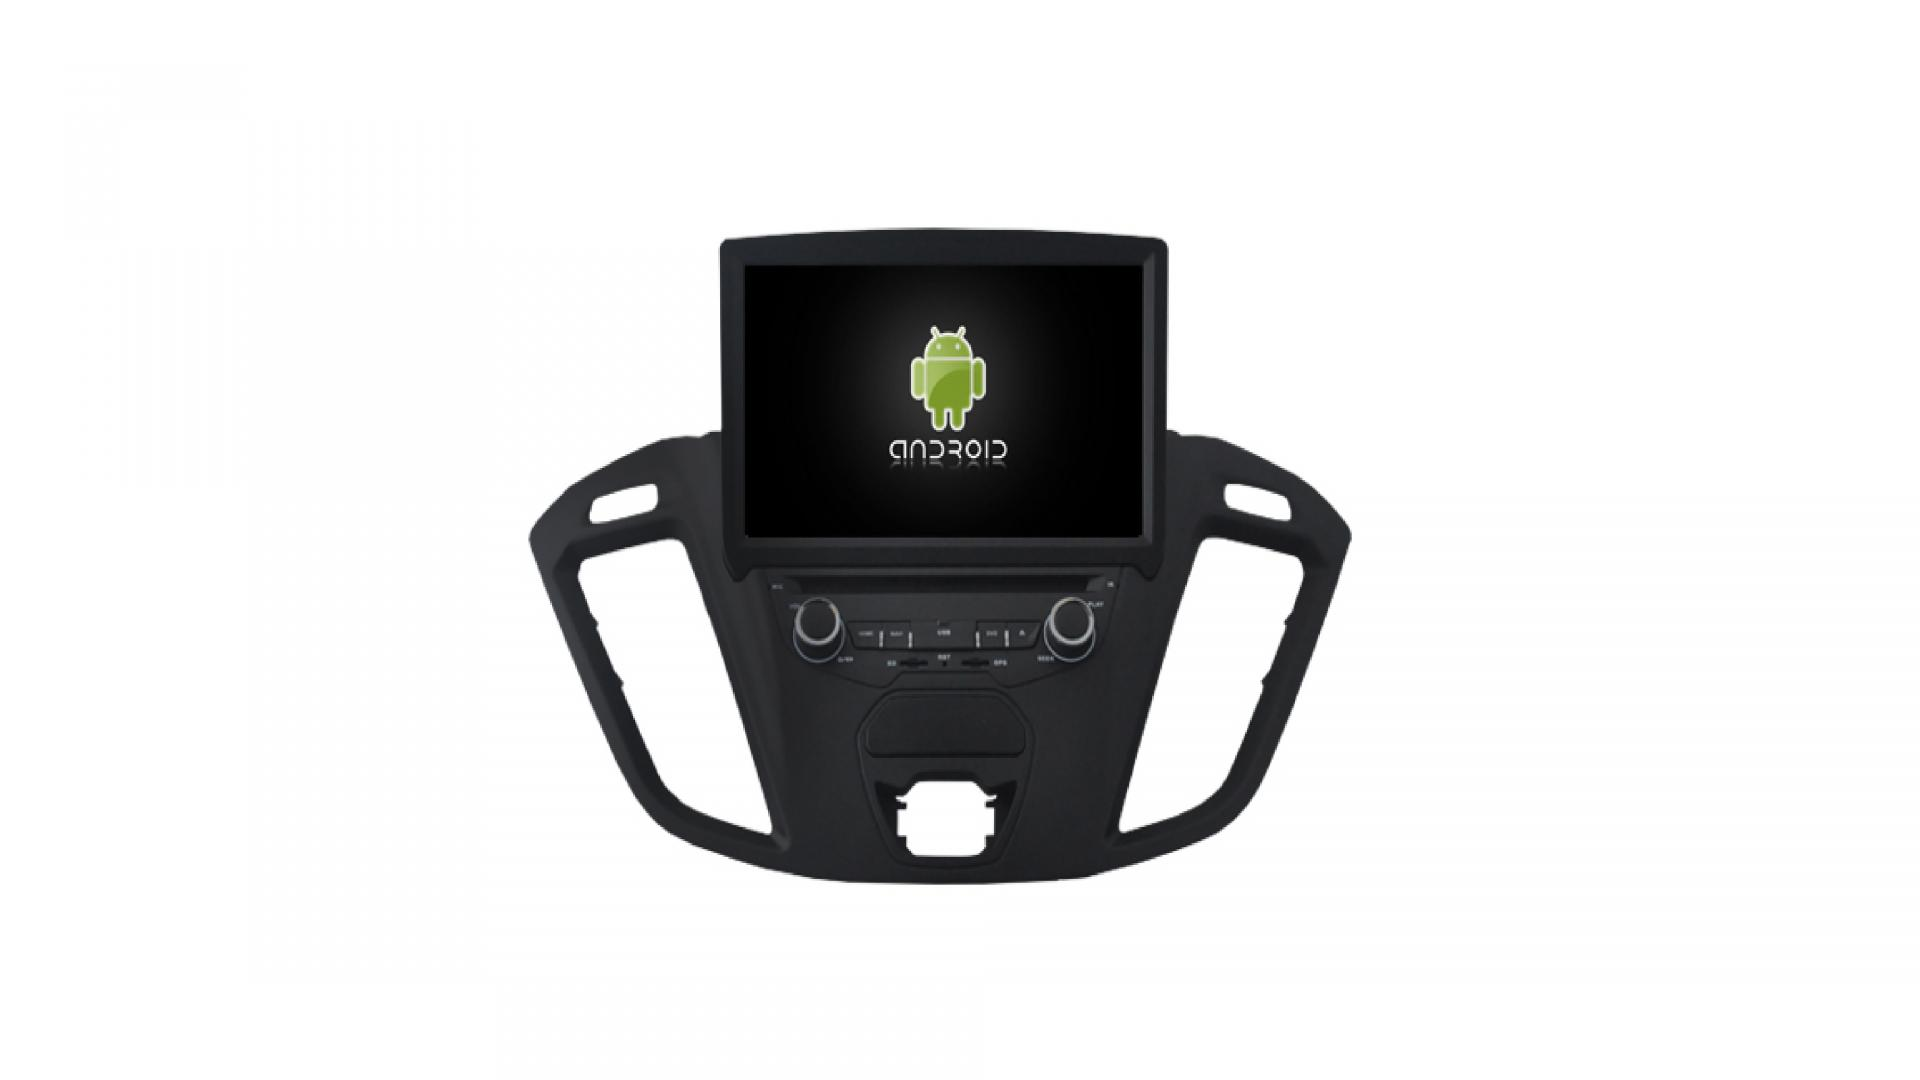 Tourneo transit autoradio gps bluetooth ford mustang explorer edge fusion focus android camera de recul commande au volant ipod tv dvbt 3g 4g pas cher wifi poste usb sd tnt double